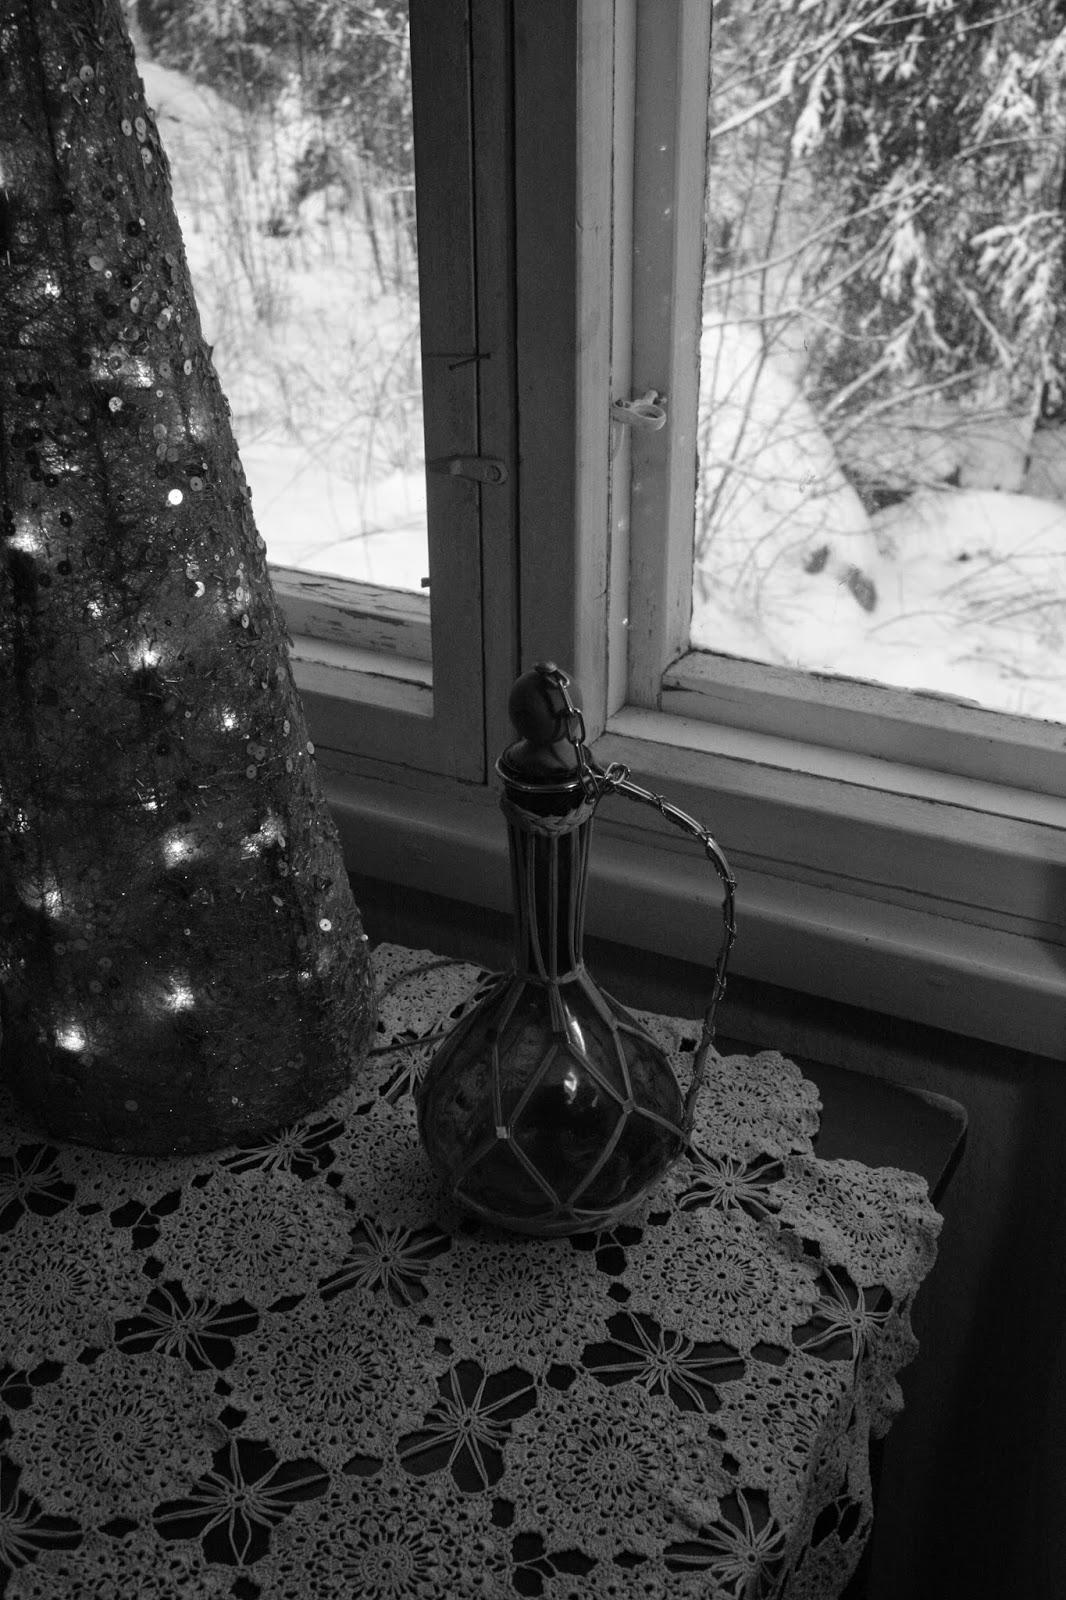 likööri, karahvi, winter, liqueur,carafe, decanter, garrafa, licor, ikkuna